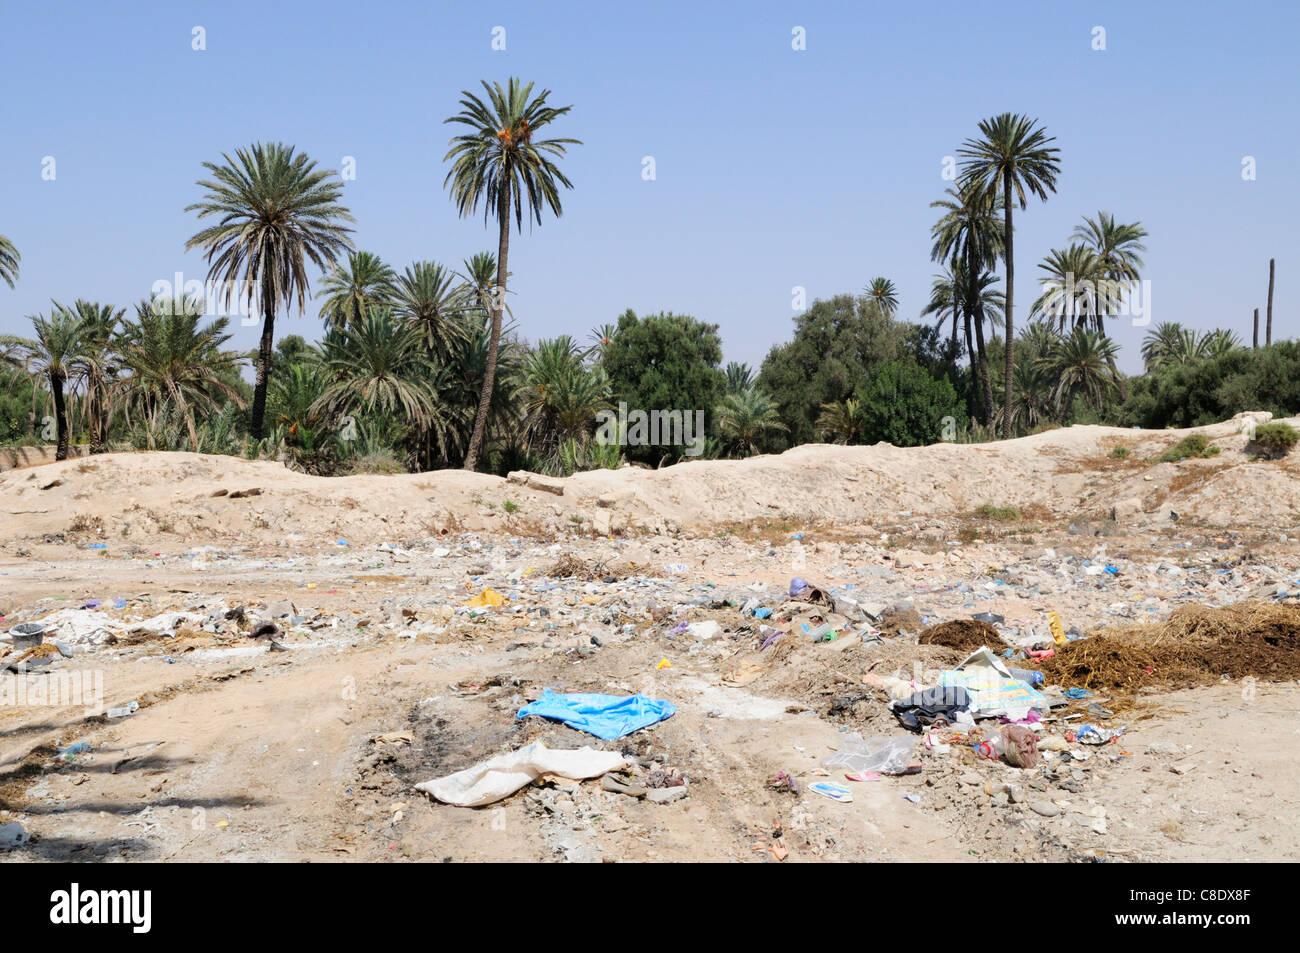 Rubbish Dump on the edge of The Palmeraie, Tiznit, Souss-Massa-Draa Region, Morocco - Stock Image